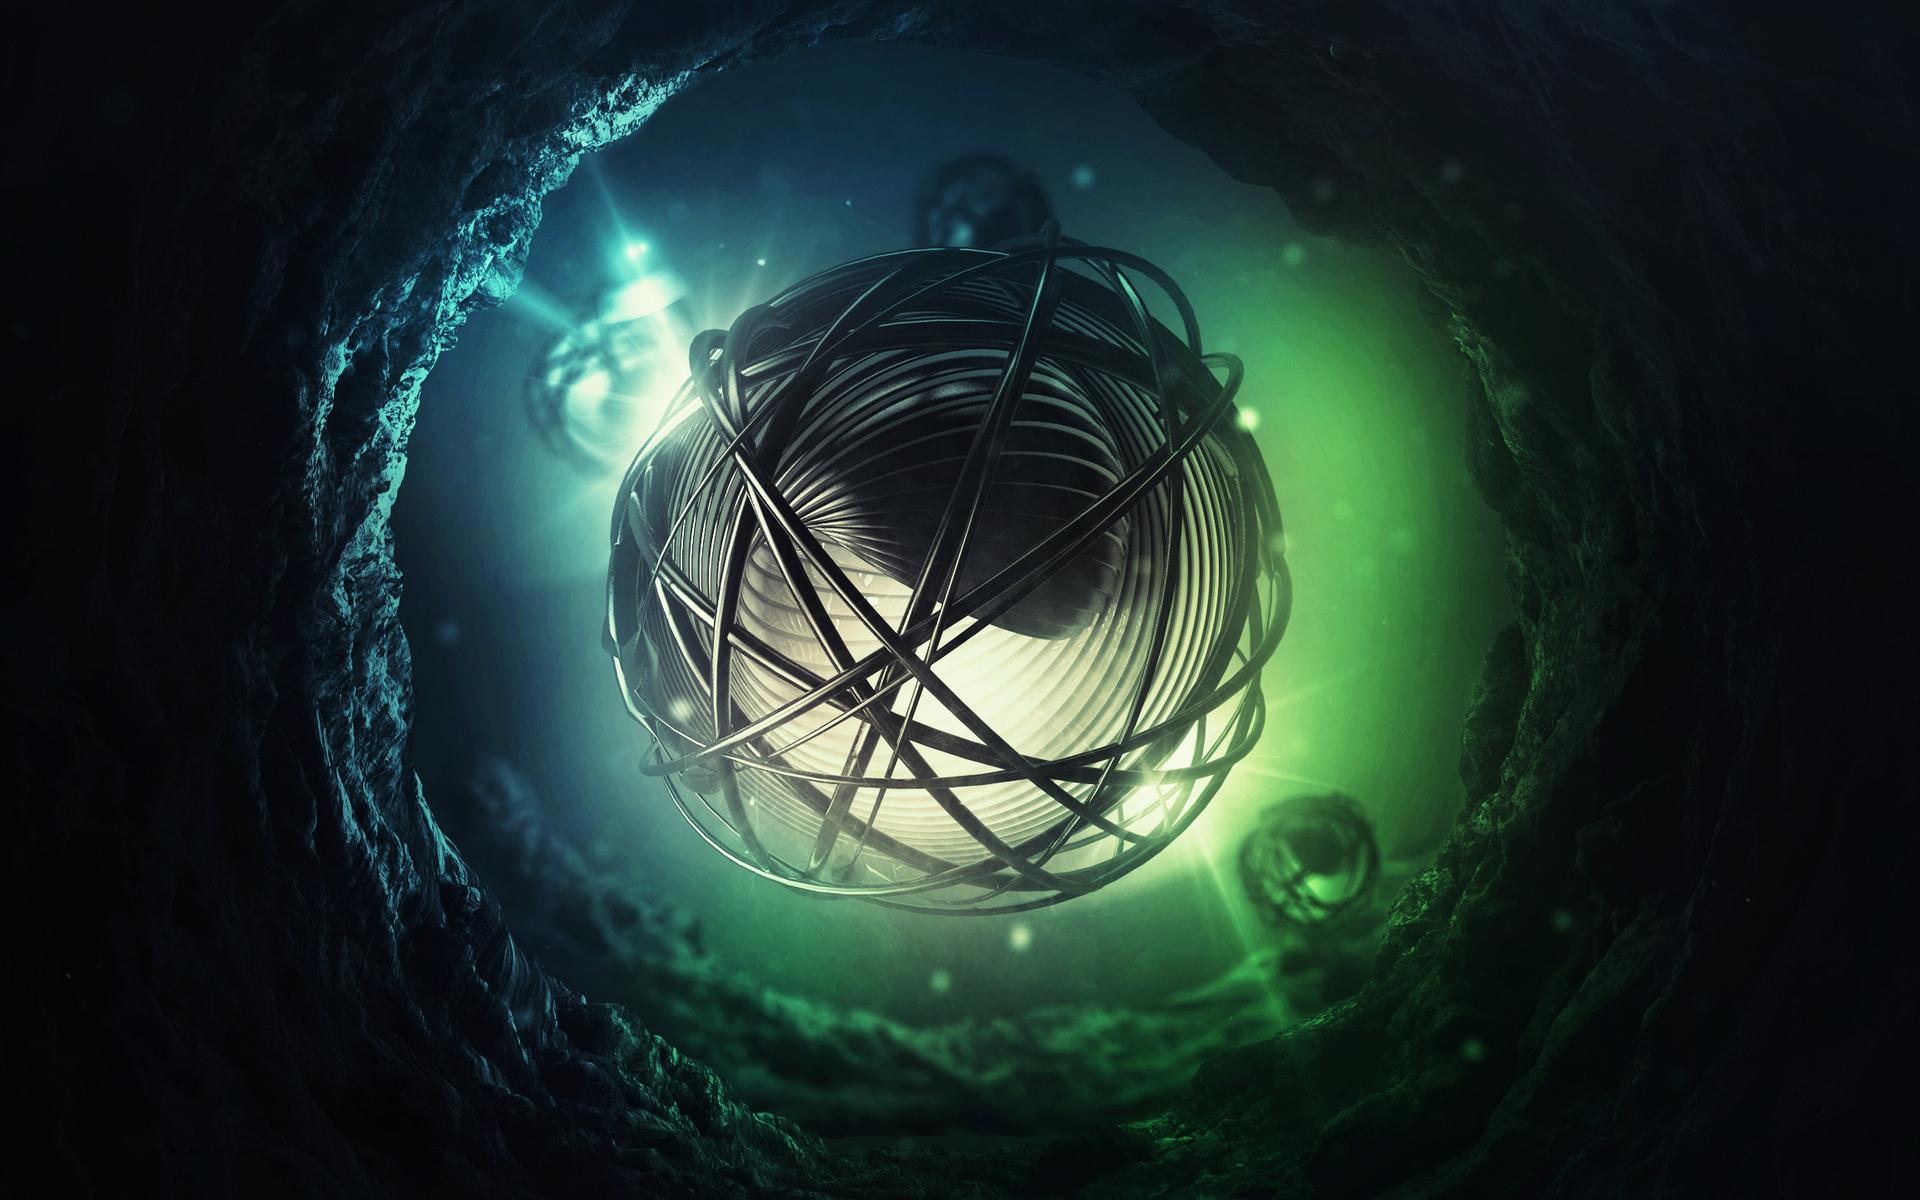 Abstract Cg Digital Art 3d Sci Fi Science Fiction Underwater Water Lights Psychedelic Dark